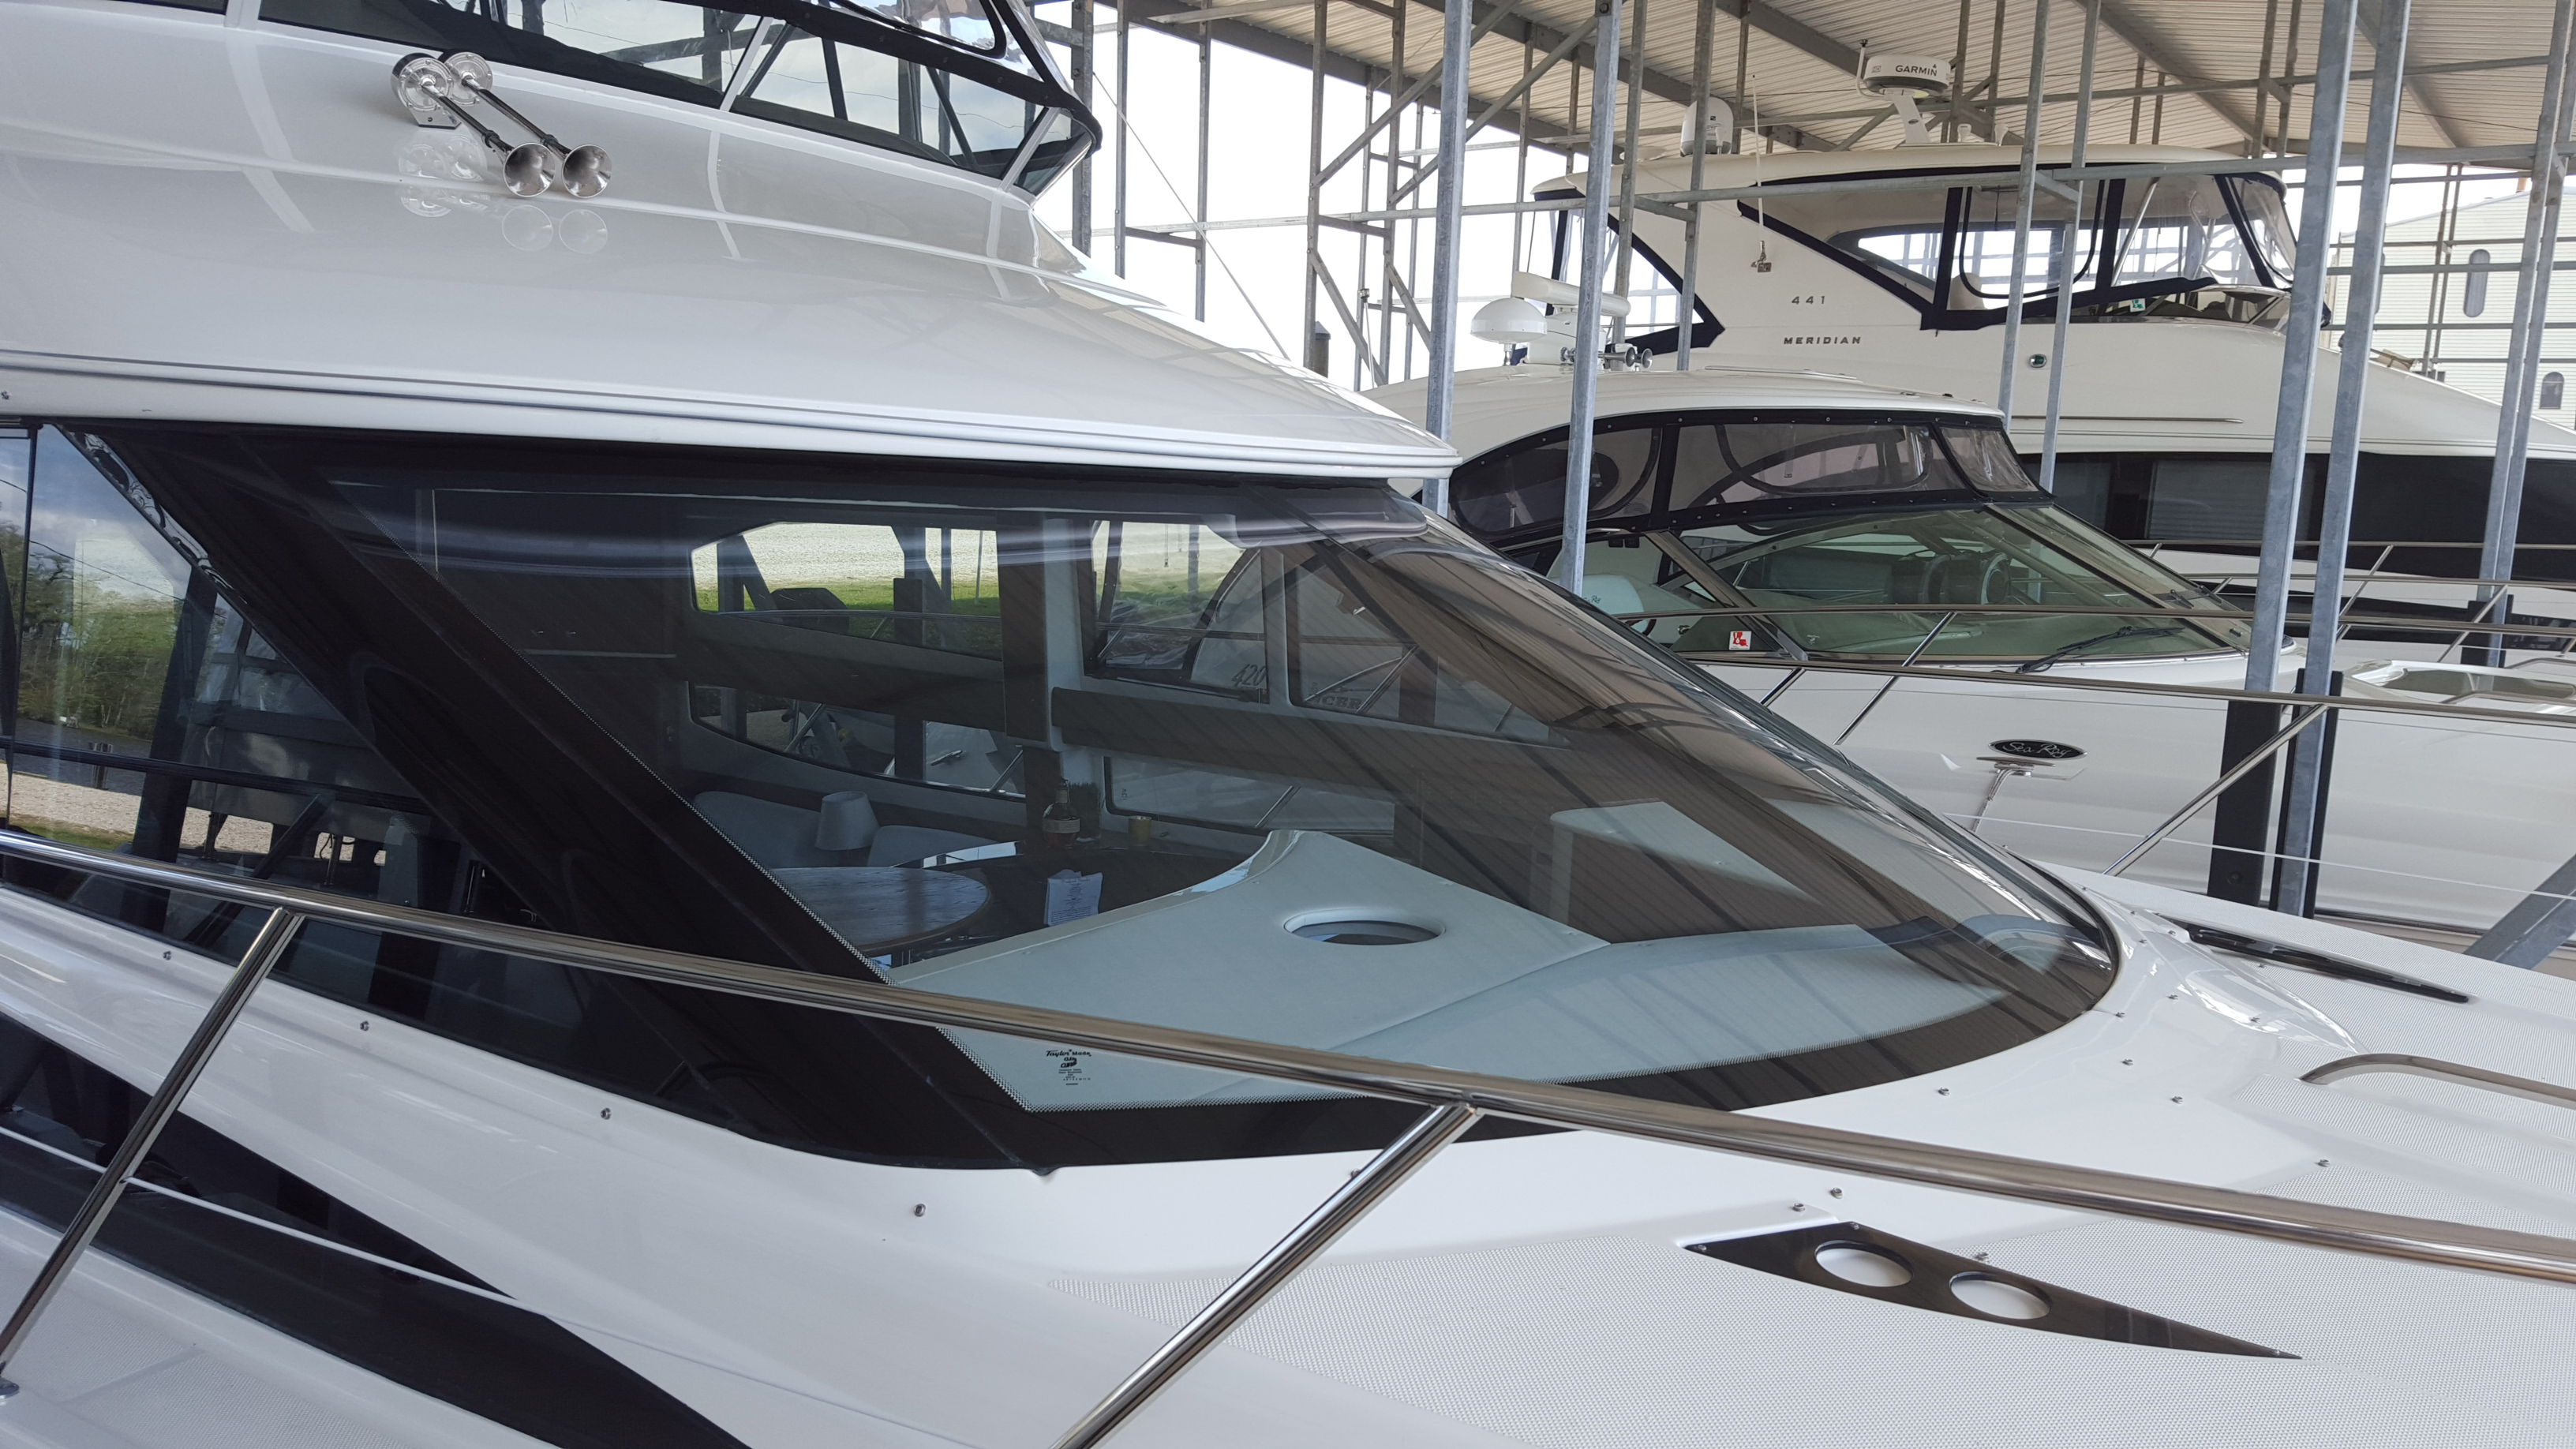 Marine & Boats, Automotive Tinting - The Tint Guy, OKC